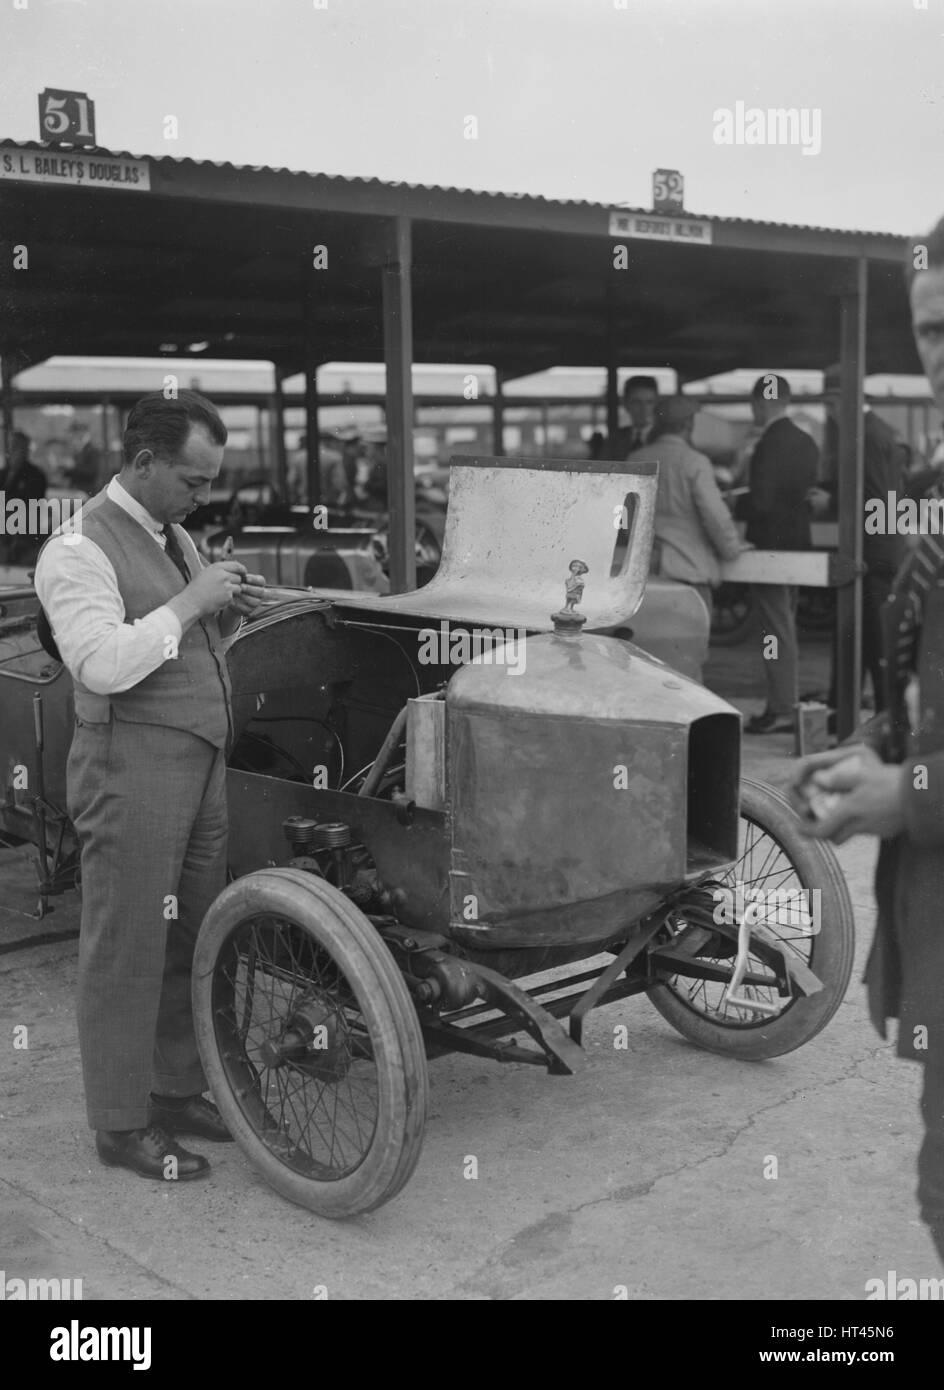 Douglas racing car of SL Bailey at the JCC 200 Mile Race, Brooklands, Surrey, 1921. Artist: Bill Brunell. - Stock Image